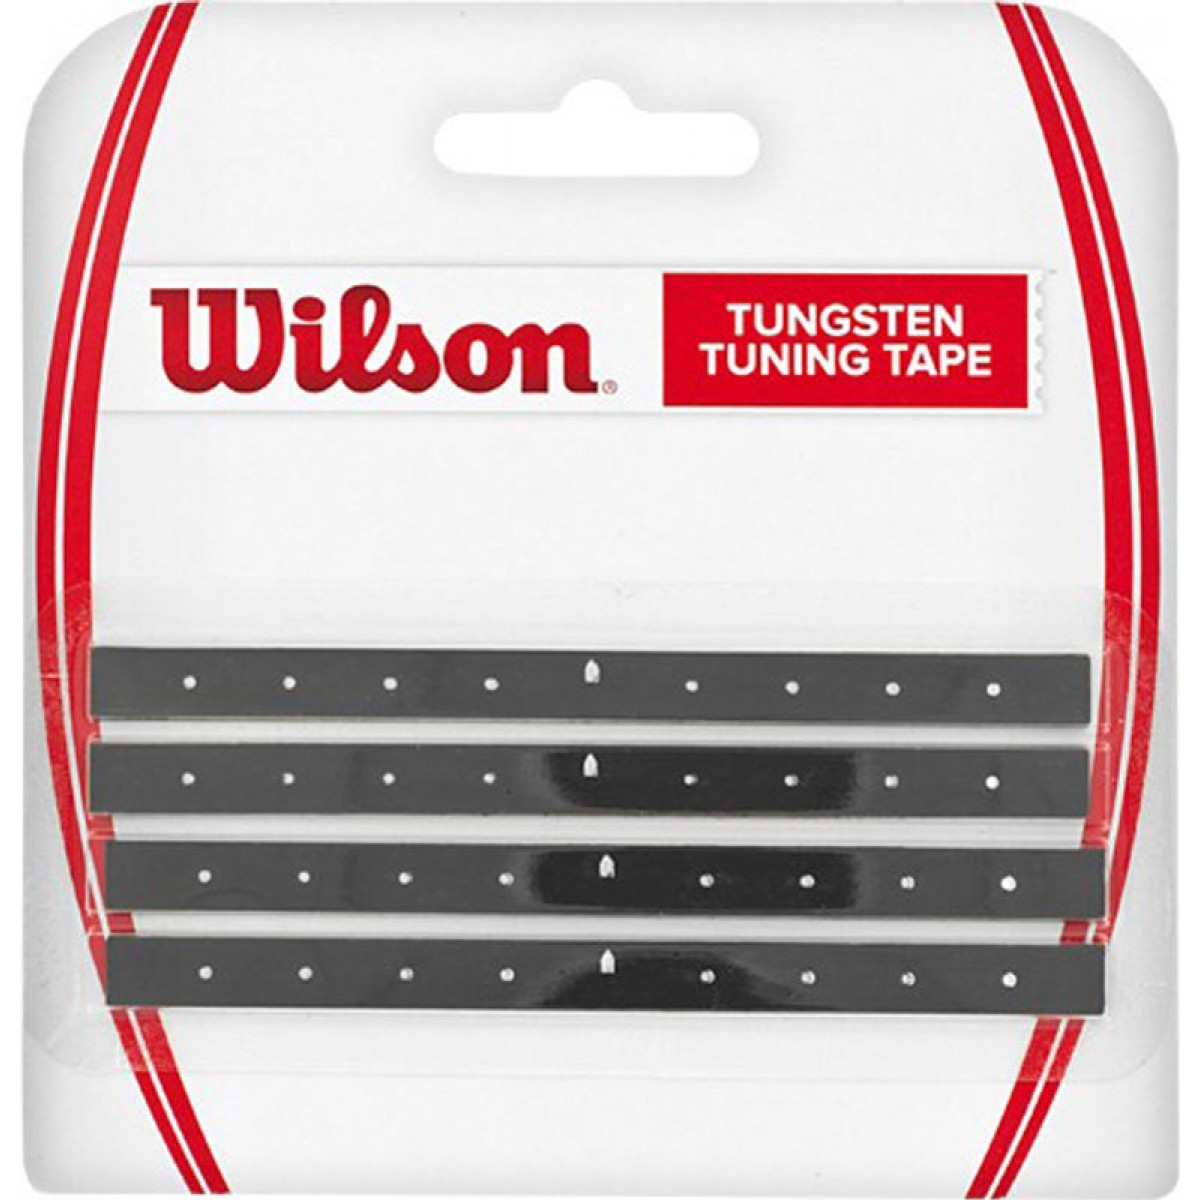 PLOMB WILSON TUNGSTEN TUNING TAPE